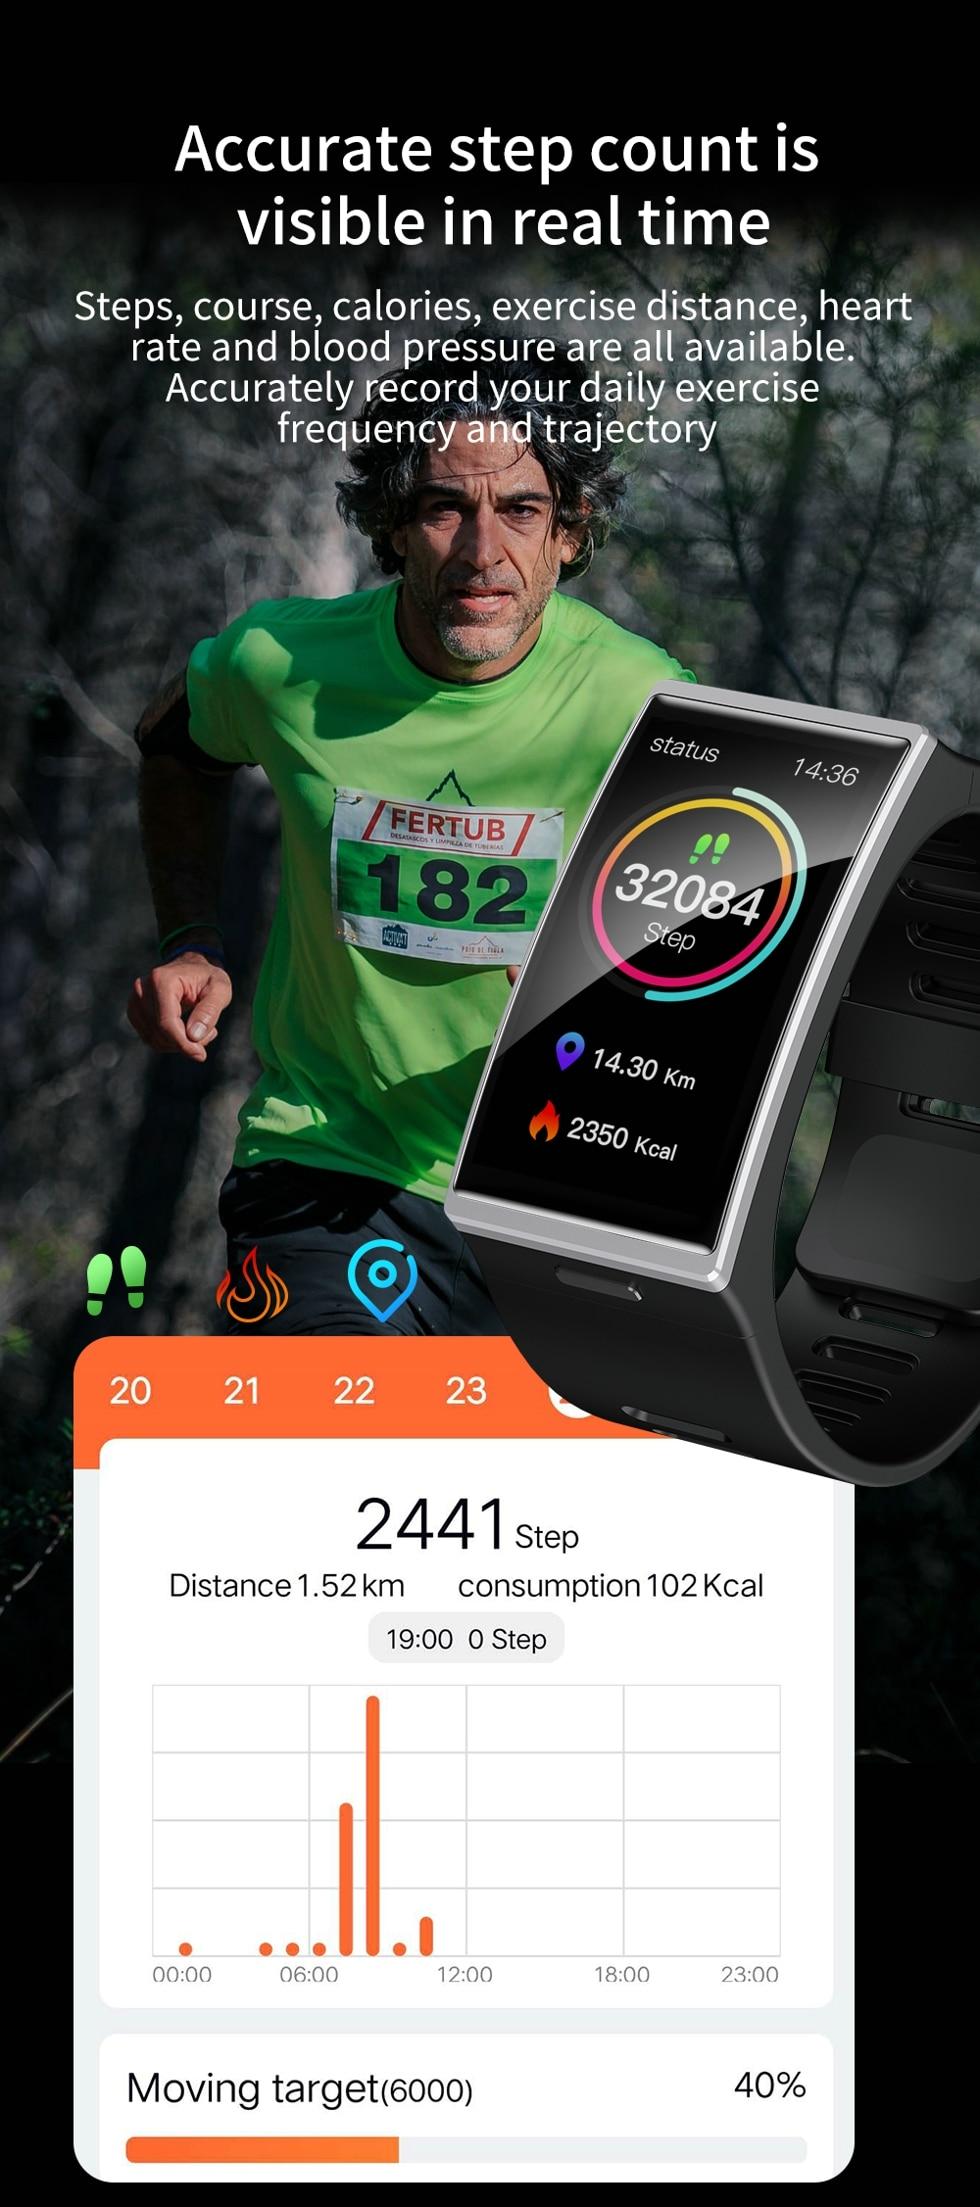 Hc190ddfd644c4eeba24b7491e941e685D Smartwatch 2020 1.9 Inch 170*320 Screen LEMFO DM12 Smart Watch Men IP68 Waterproof Sport Heart Rate Blood Pressure Android IOS